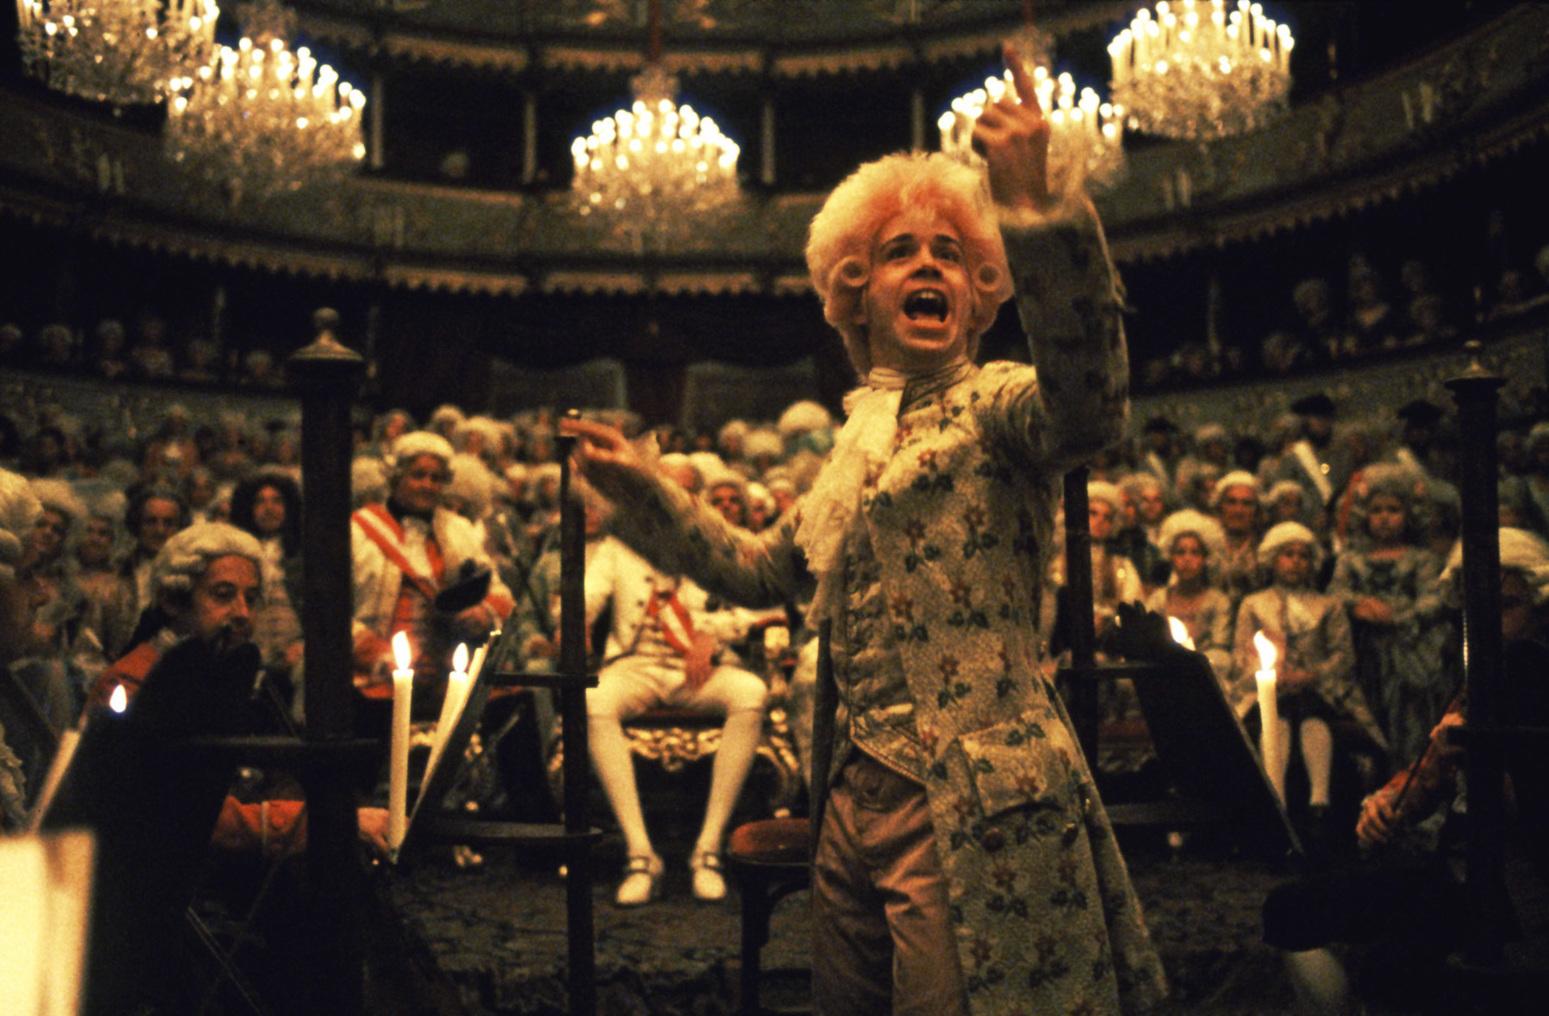 Amadeus - Milos Forman filmje. Jelenetkép